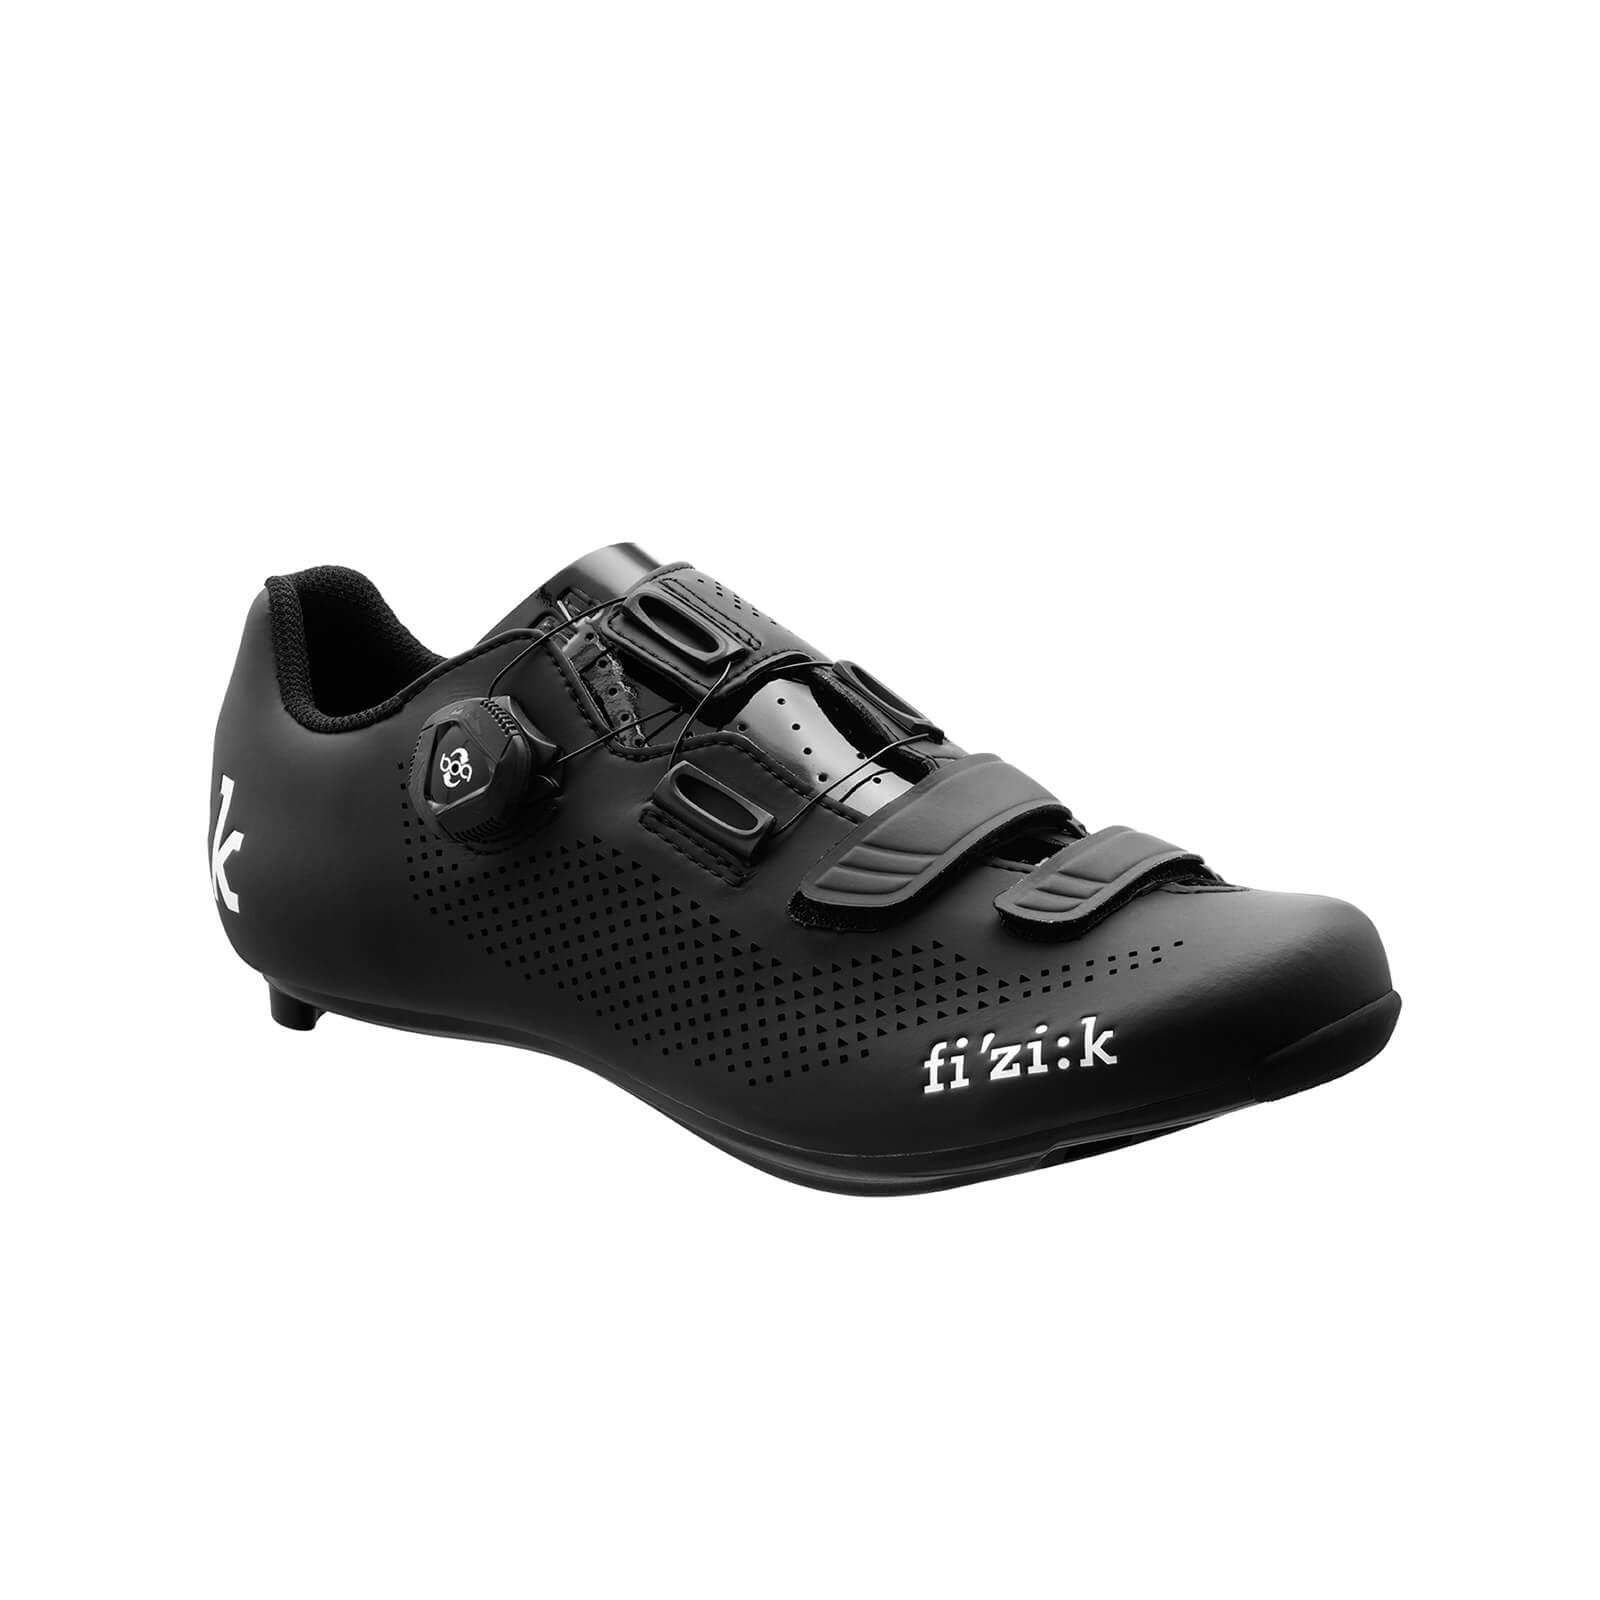 Fizik R4B Road Shoes